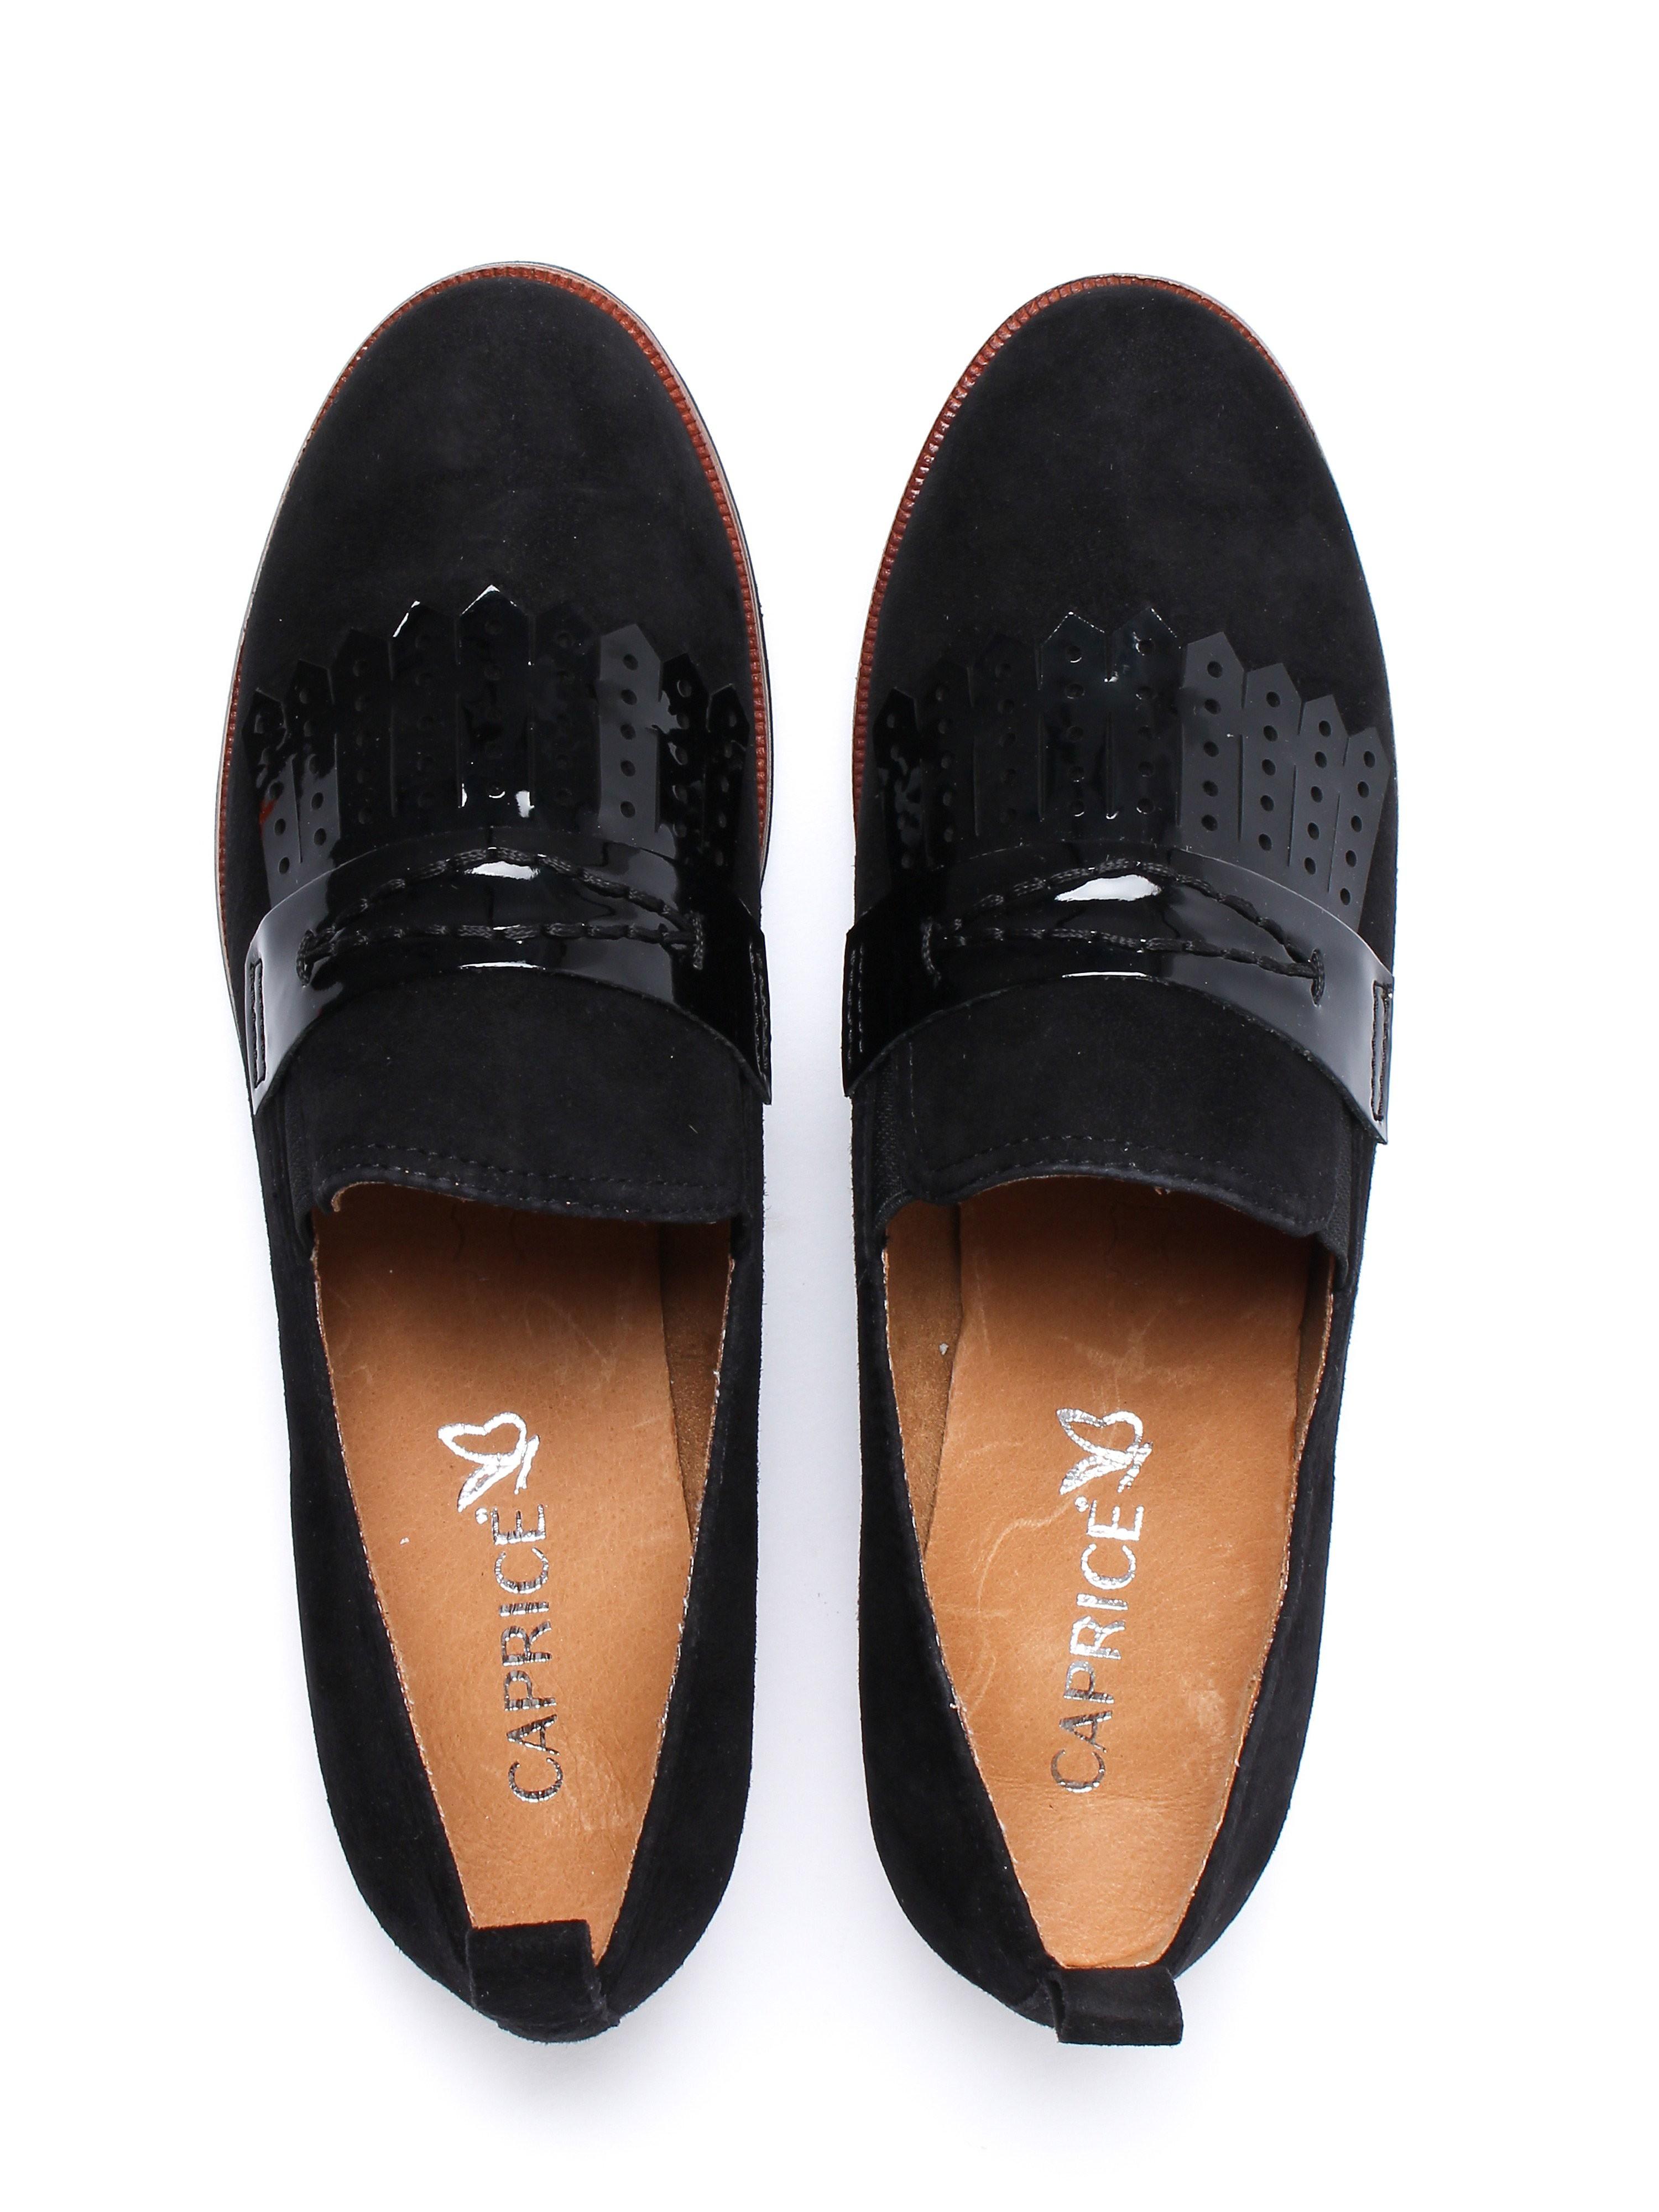 Caprice Women's Fringe Loafers - Black Suede